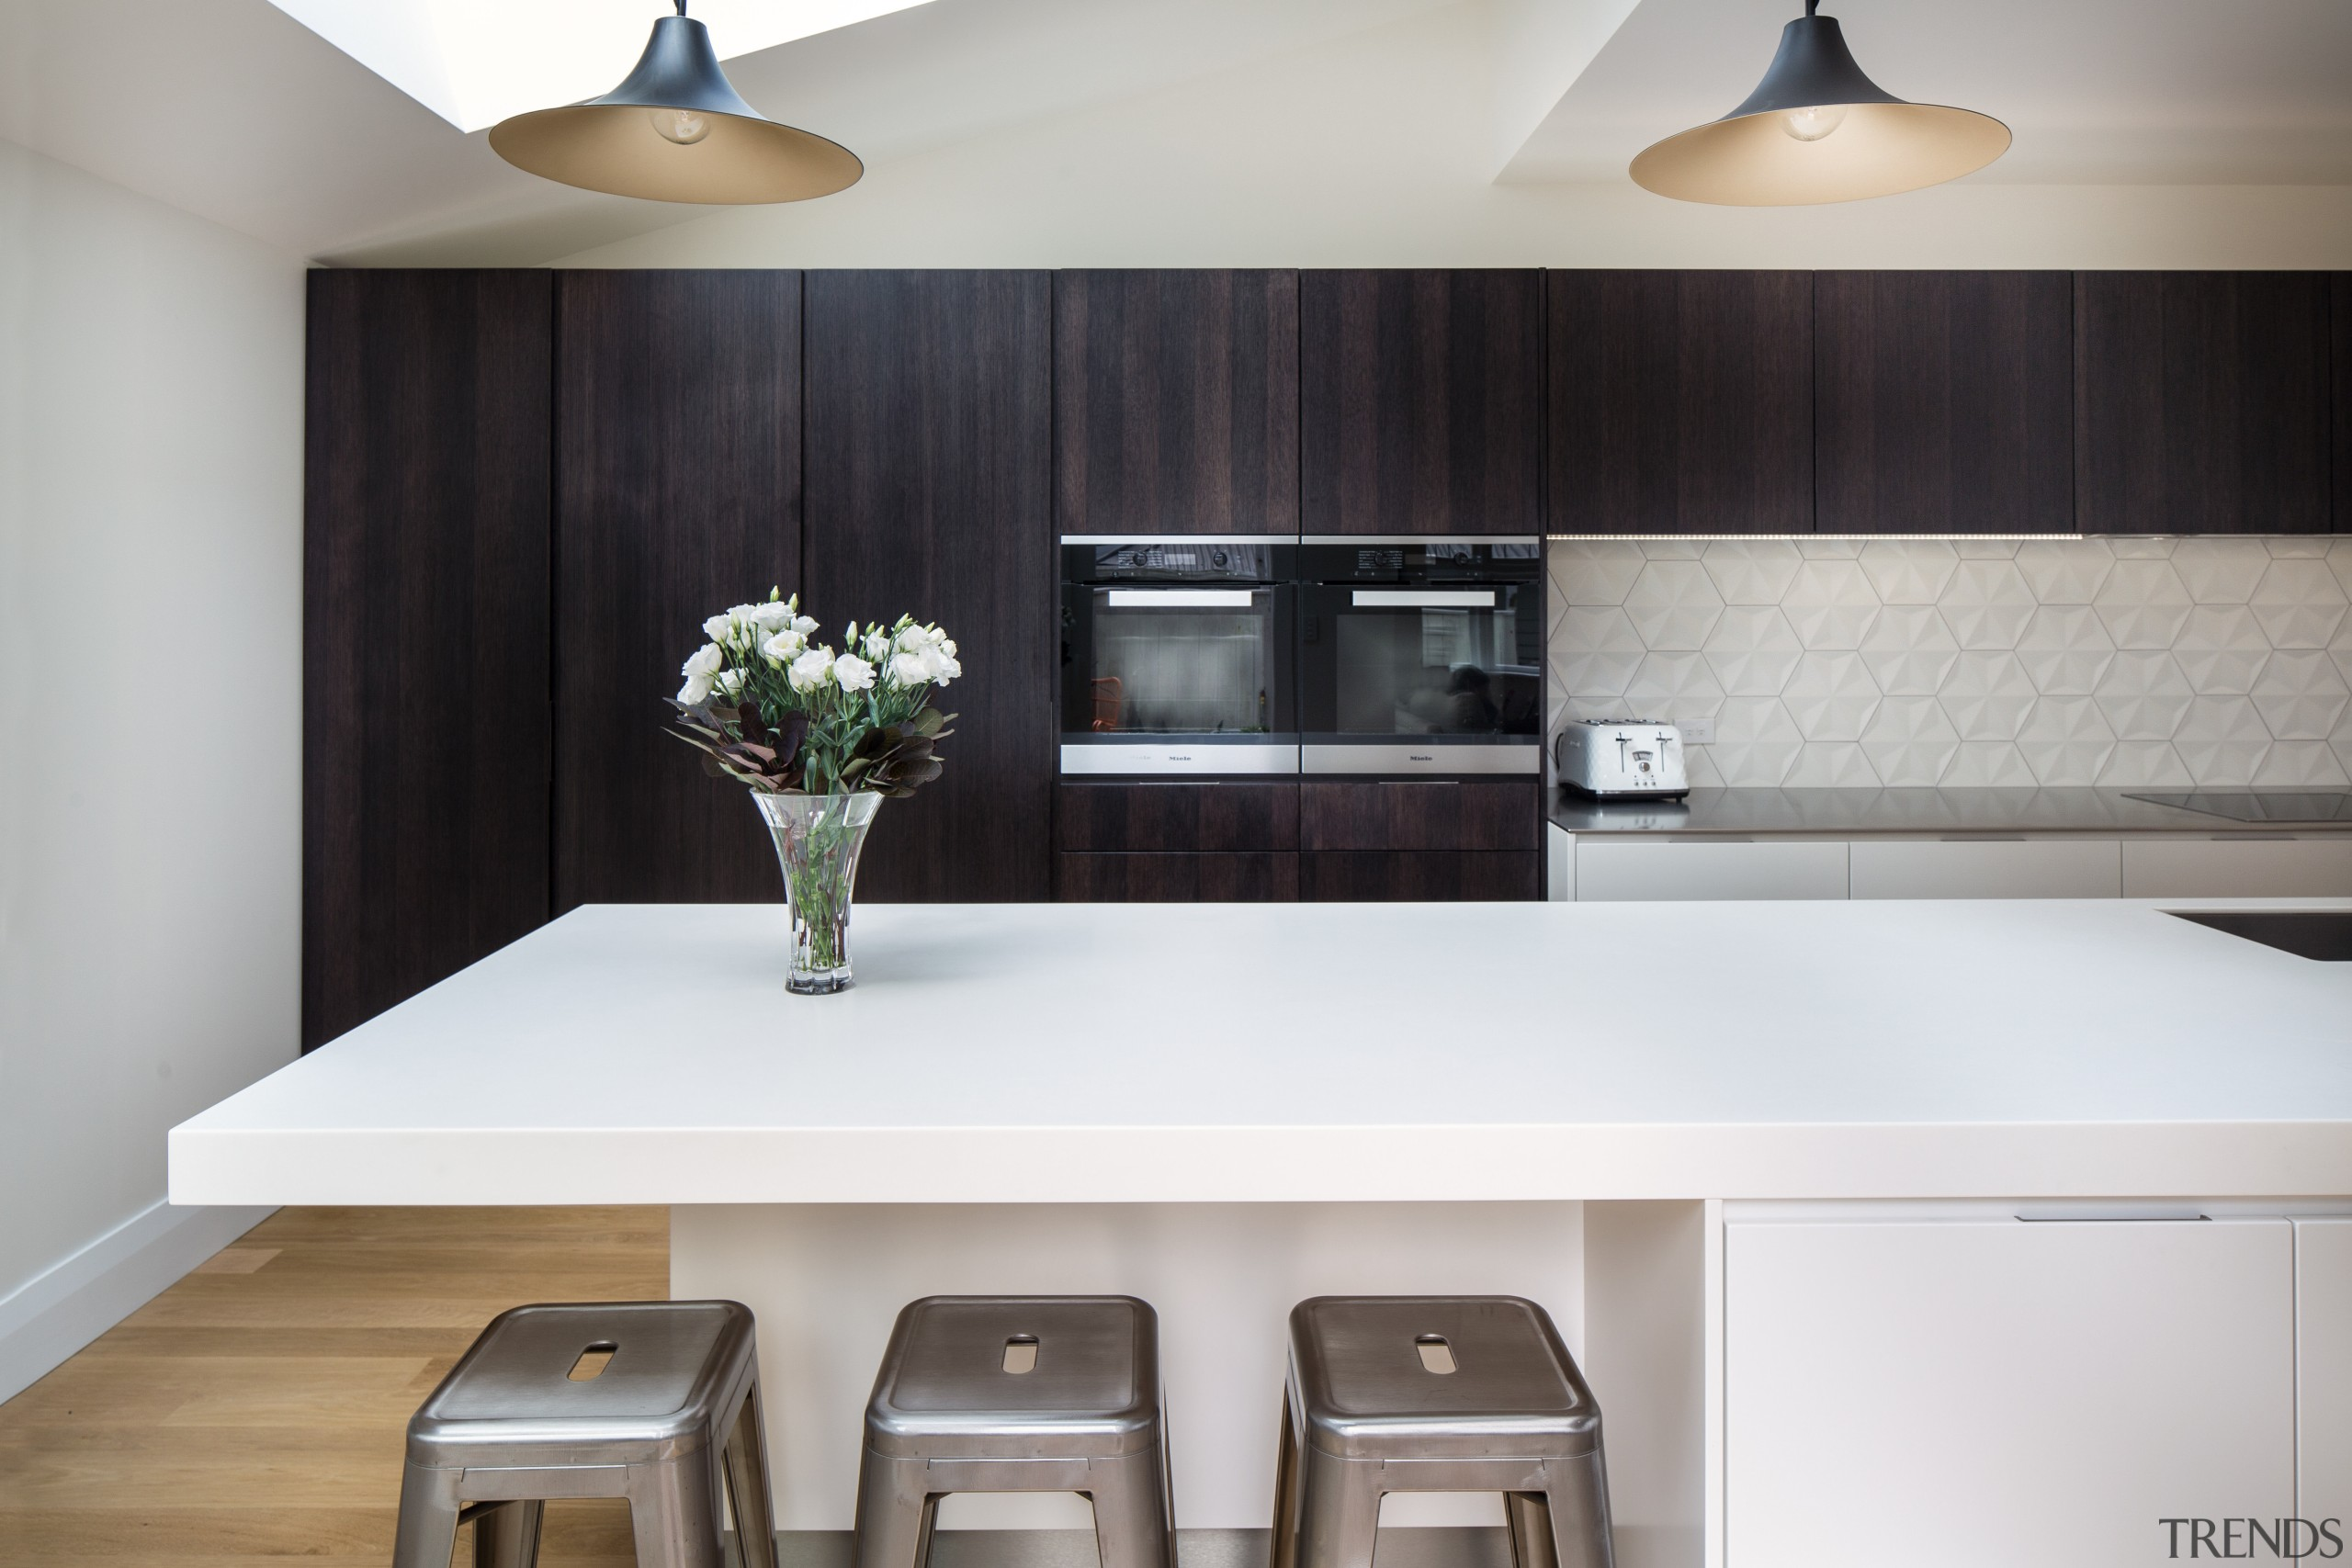 This kitchen features a two-tone colour scheme and countertop, cuisine classique, interior design, kitchen, product design, gray, black